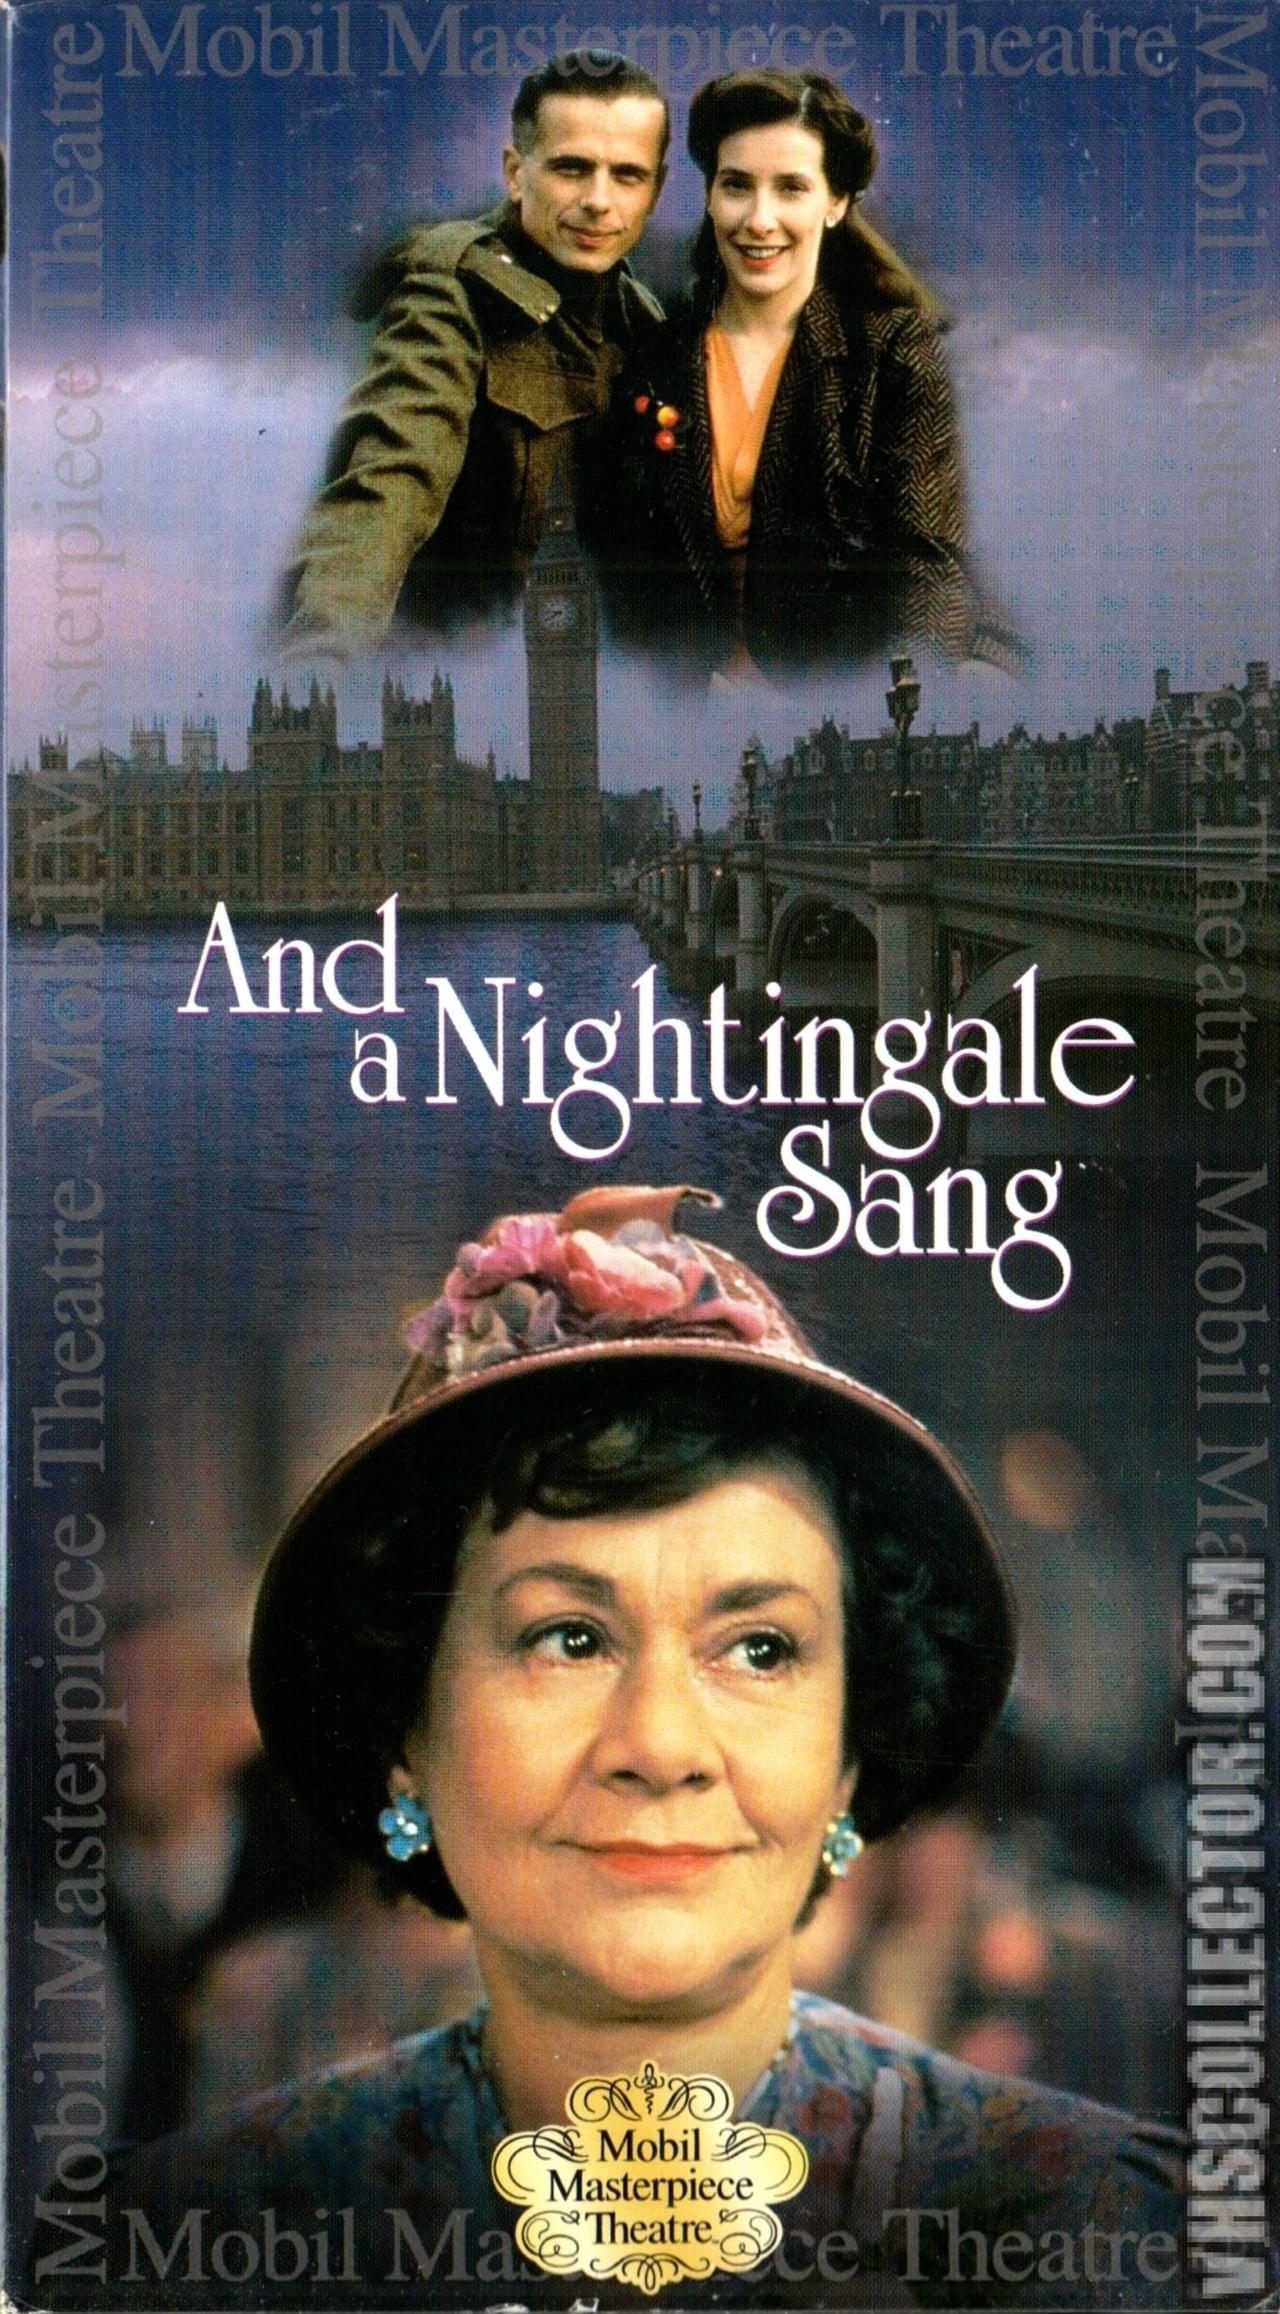 And a Nightingale Sang